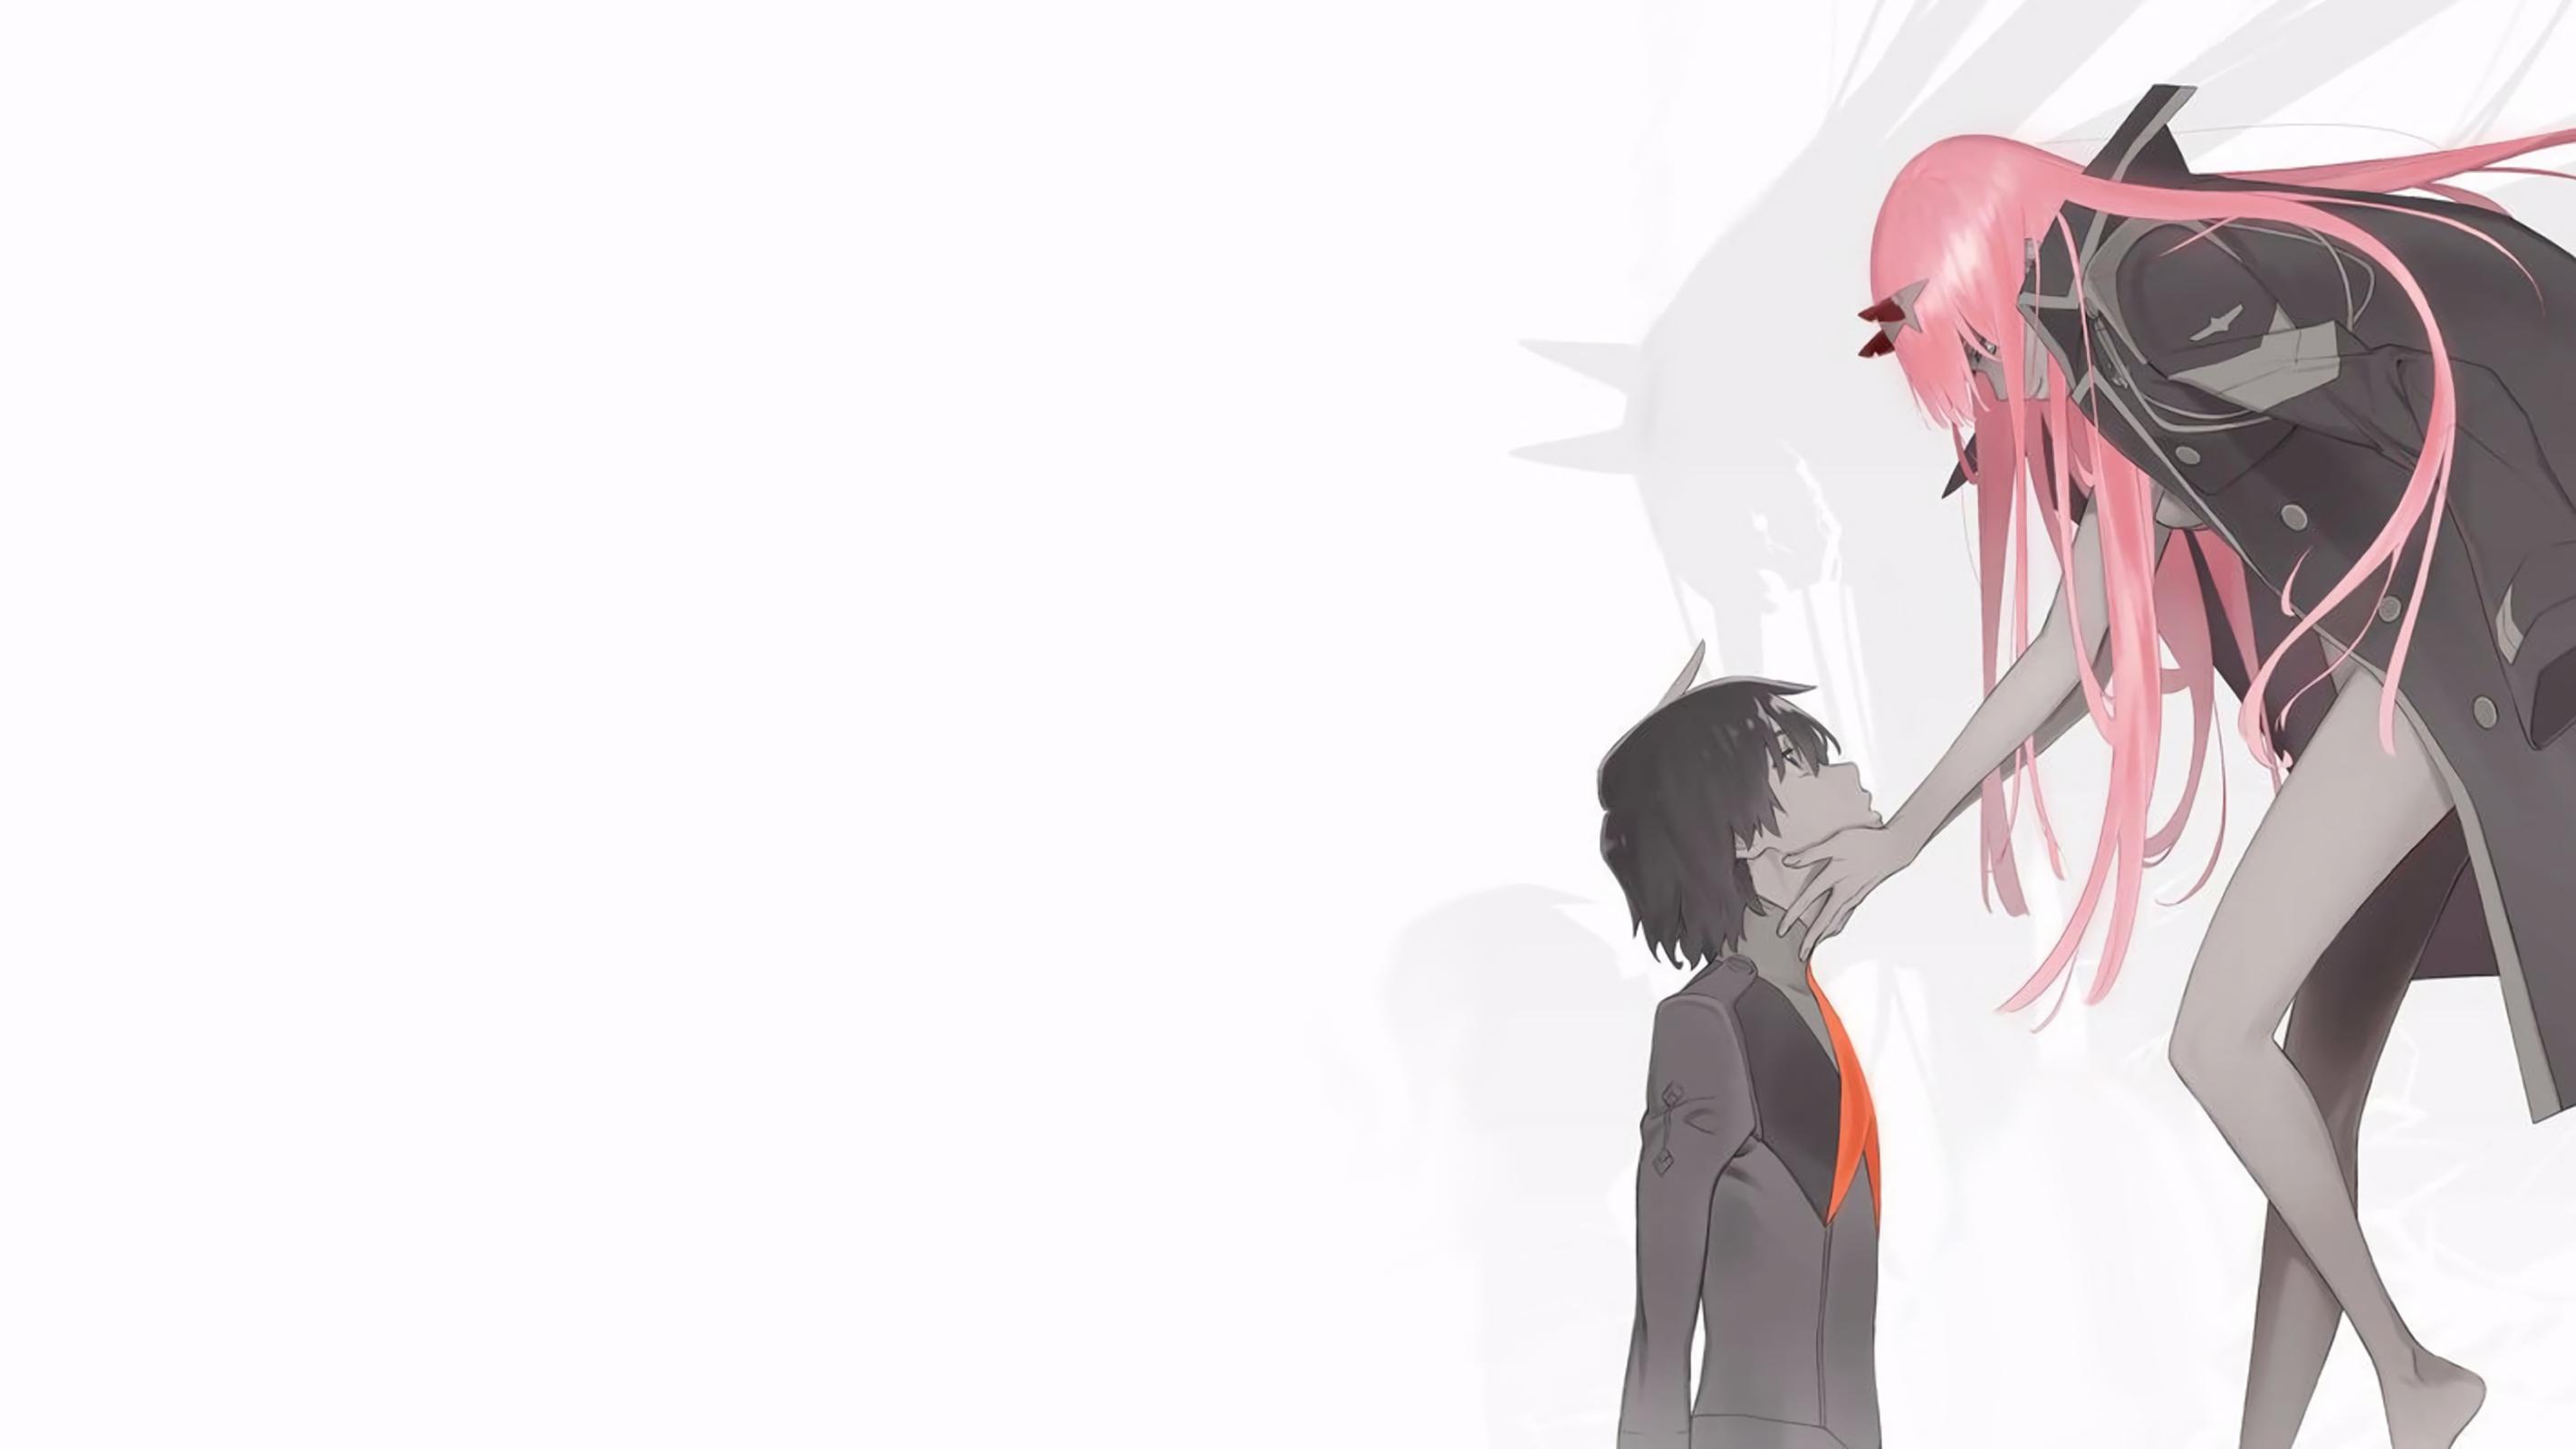 Anime 2844x1600 digital art artwork long hair anime anime girls pink hair Darling in the FranXX Code:016 (Hiro)  Code: 002(02) thighs horns anime boys simple background Zero Two (Darling in the FranXX)